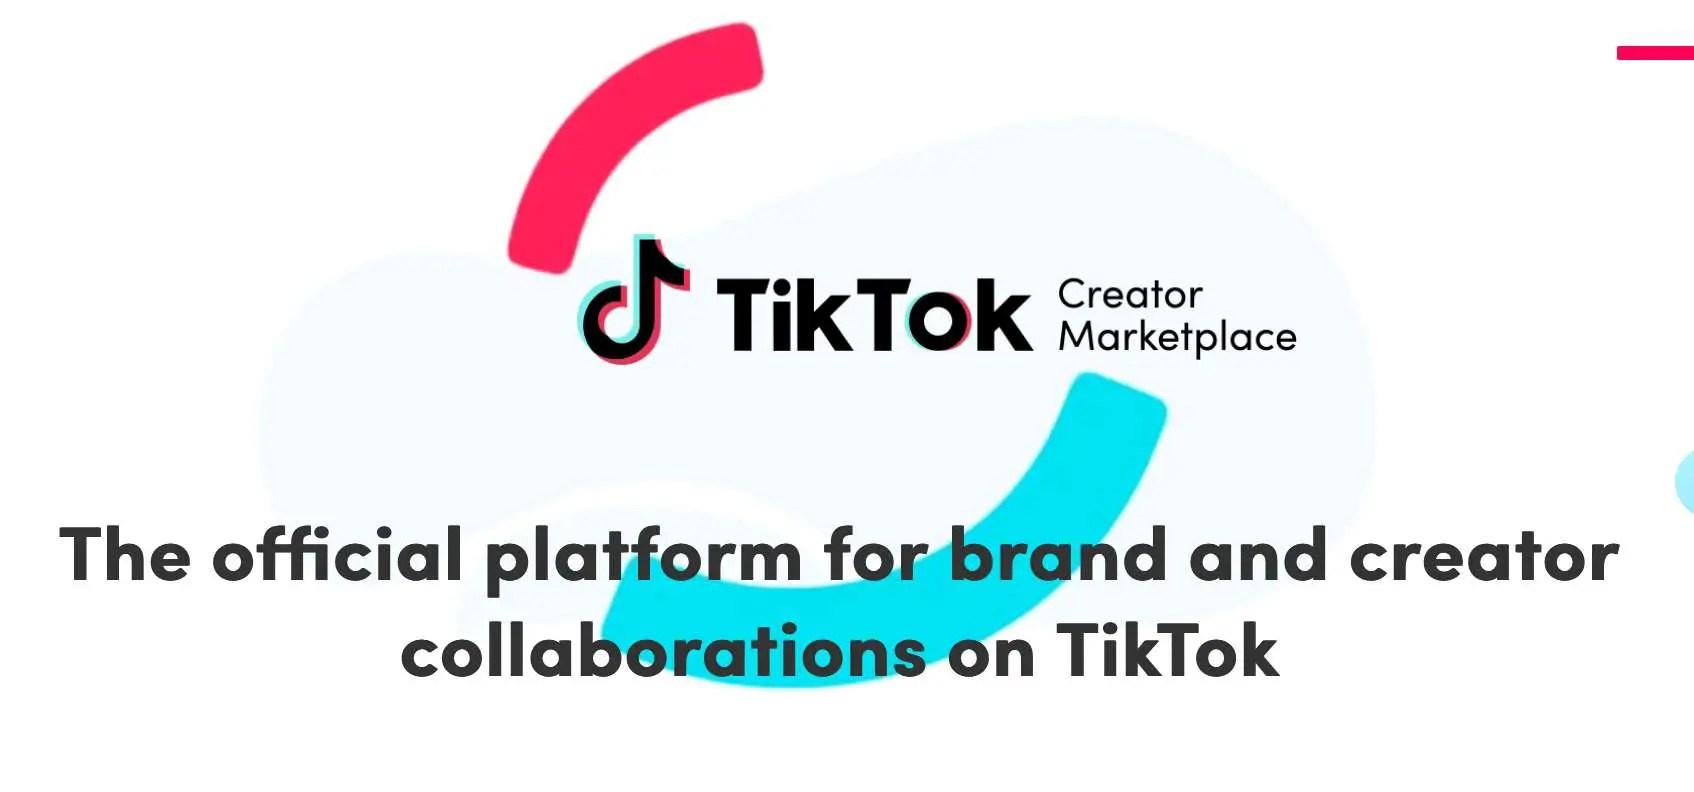 tiktok creator marketplace